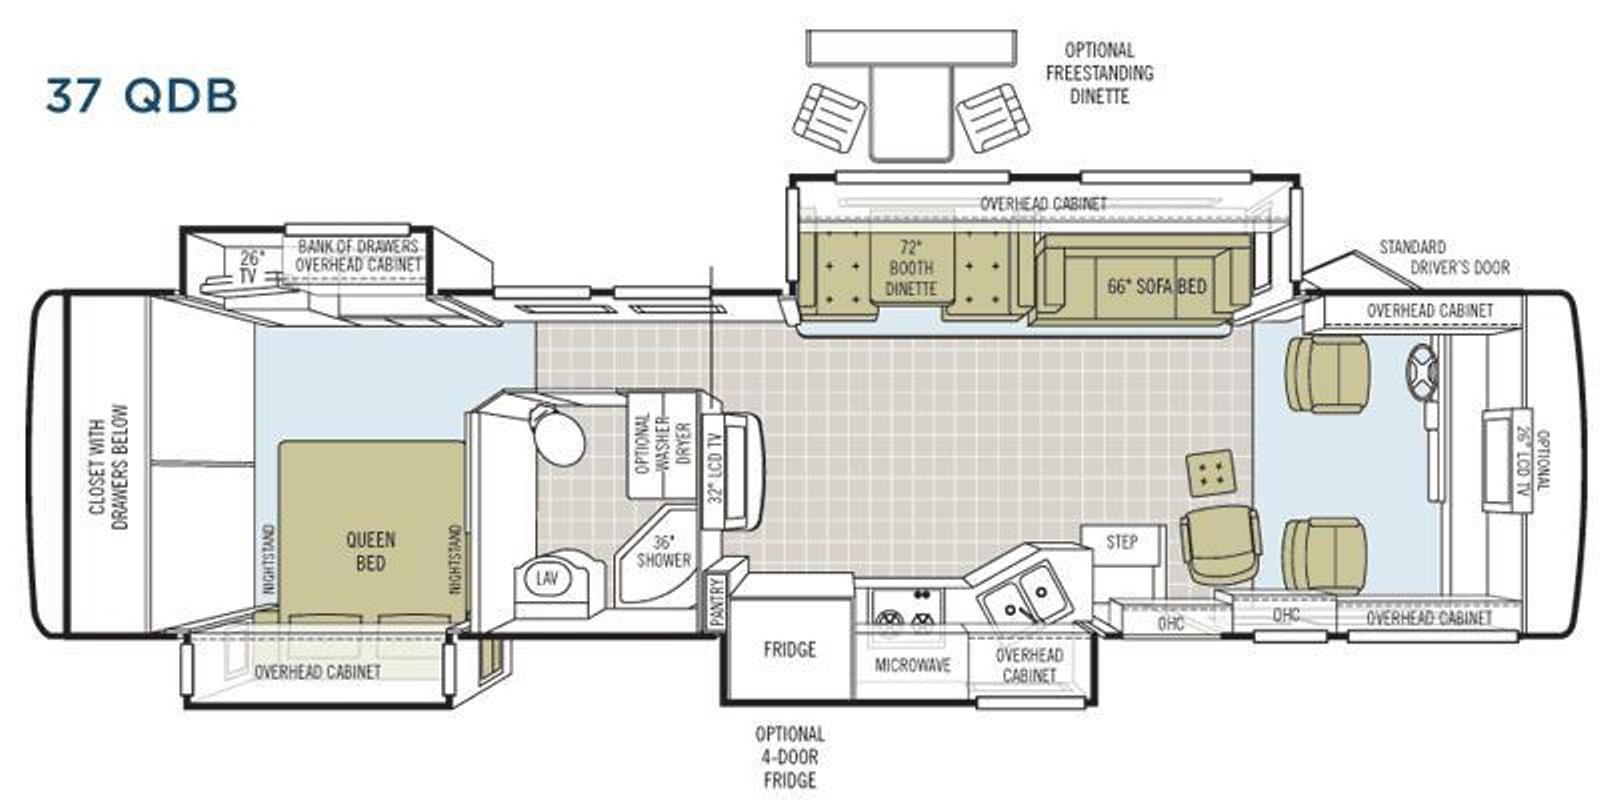 Tiffin Rv Floor Plansfull Specs For 2018 Wayfarer 24 Fw Rvs Motorhome Wiring Diagram Allegro Bay 37qdb Used Motorhomes Sale